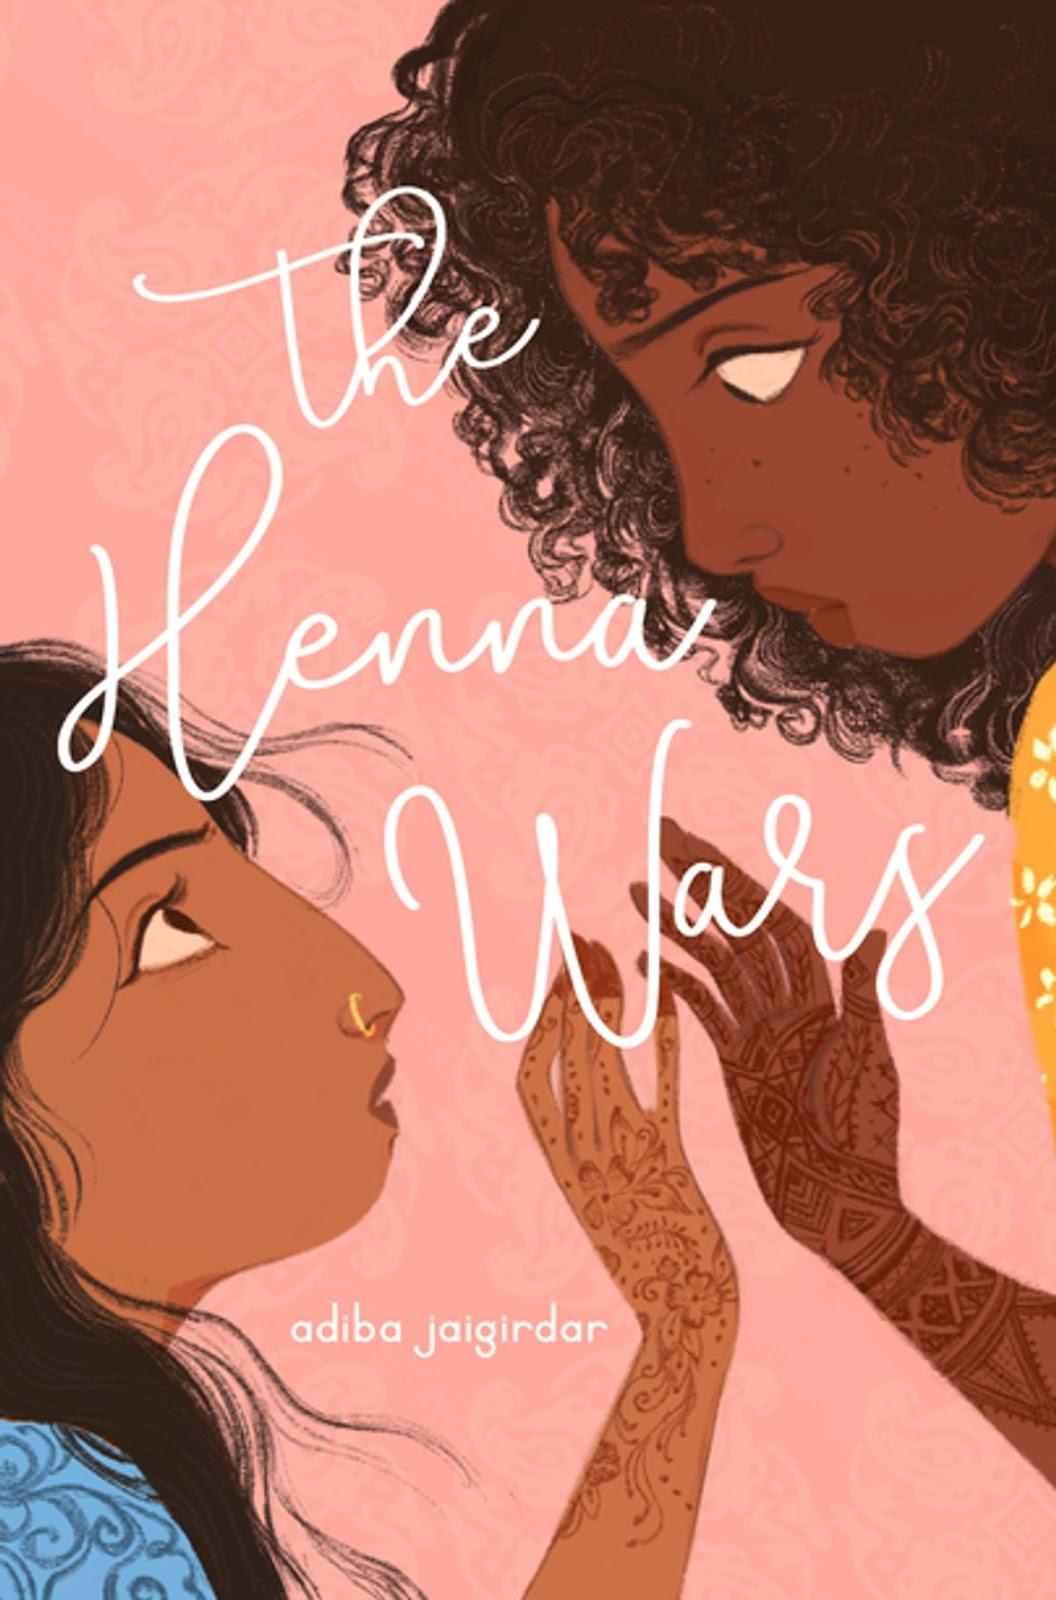 The Henna Wars by Adiba Jaigirdar | Rakuten Kobo